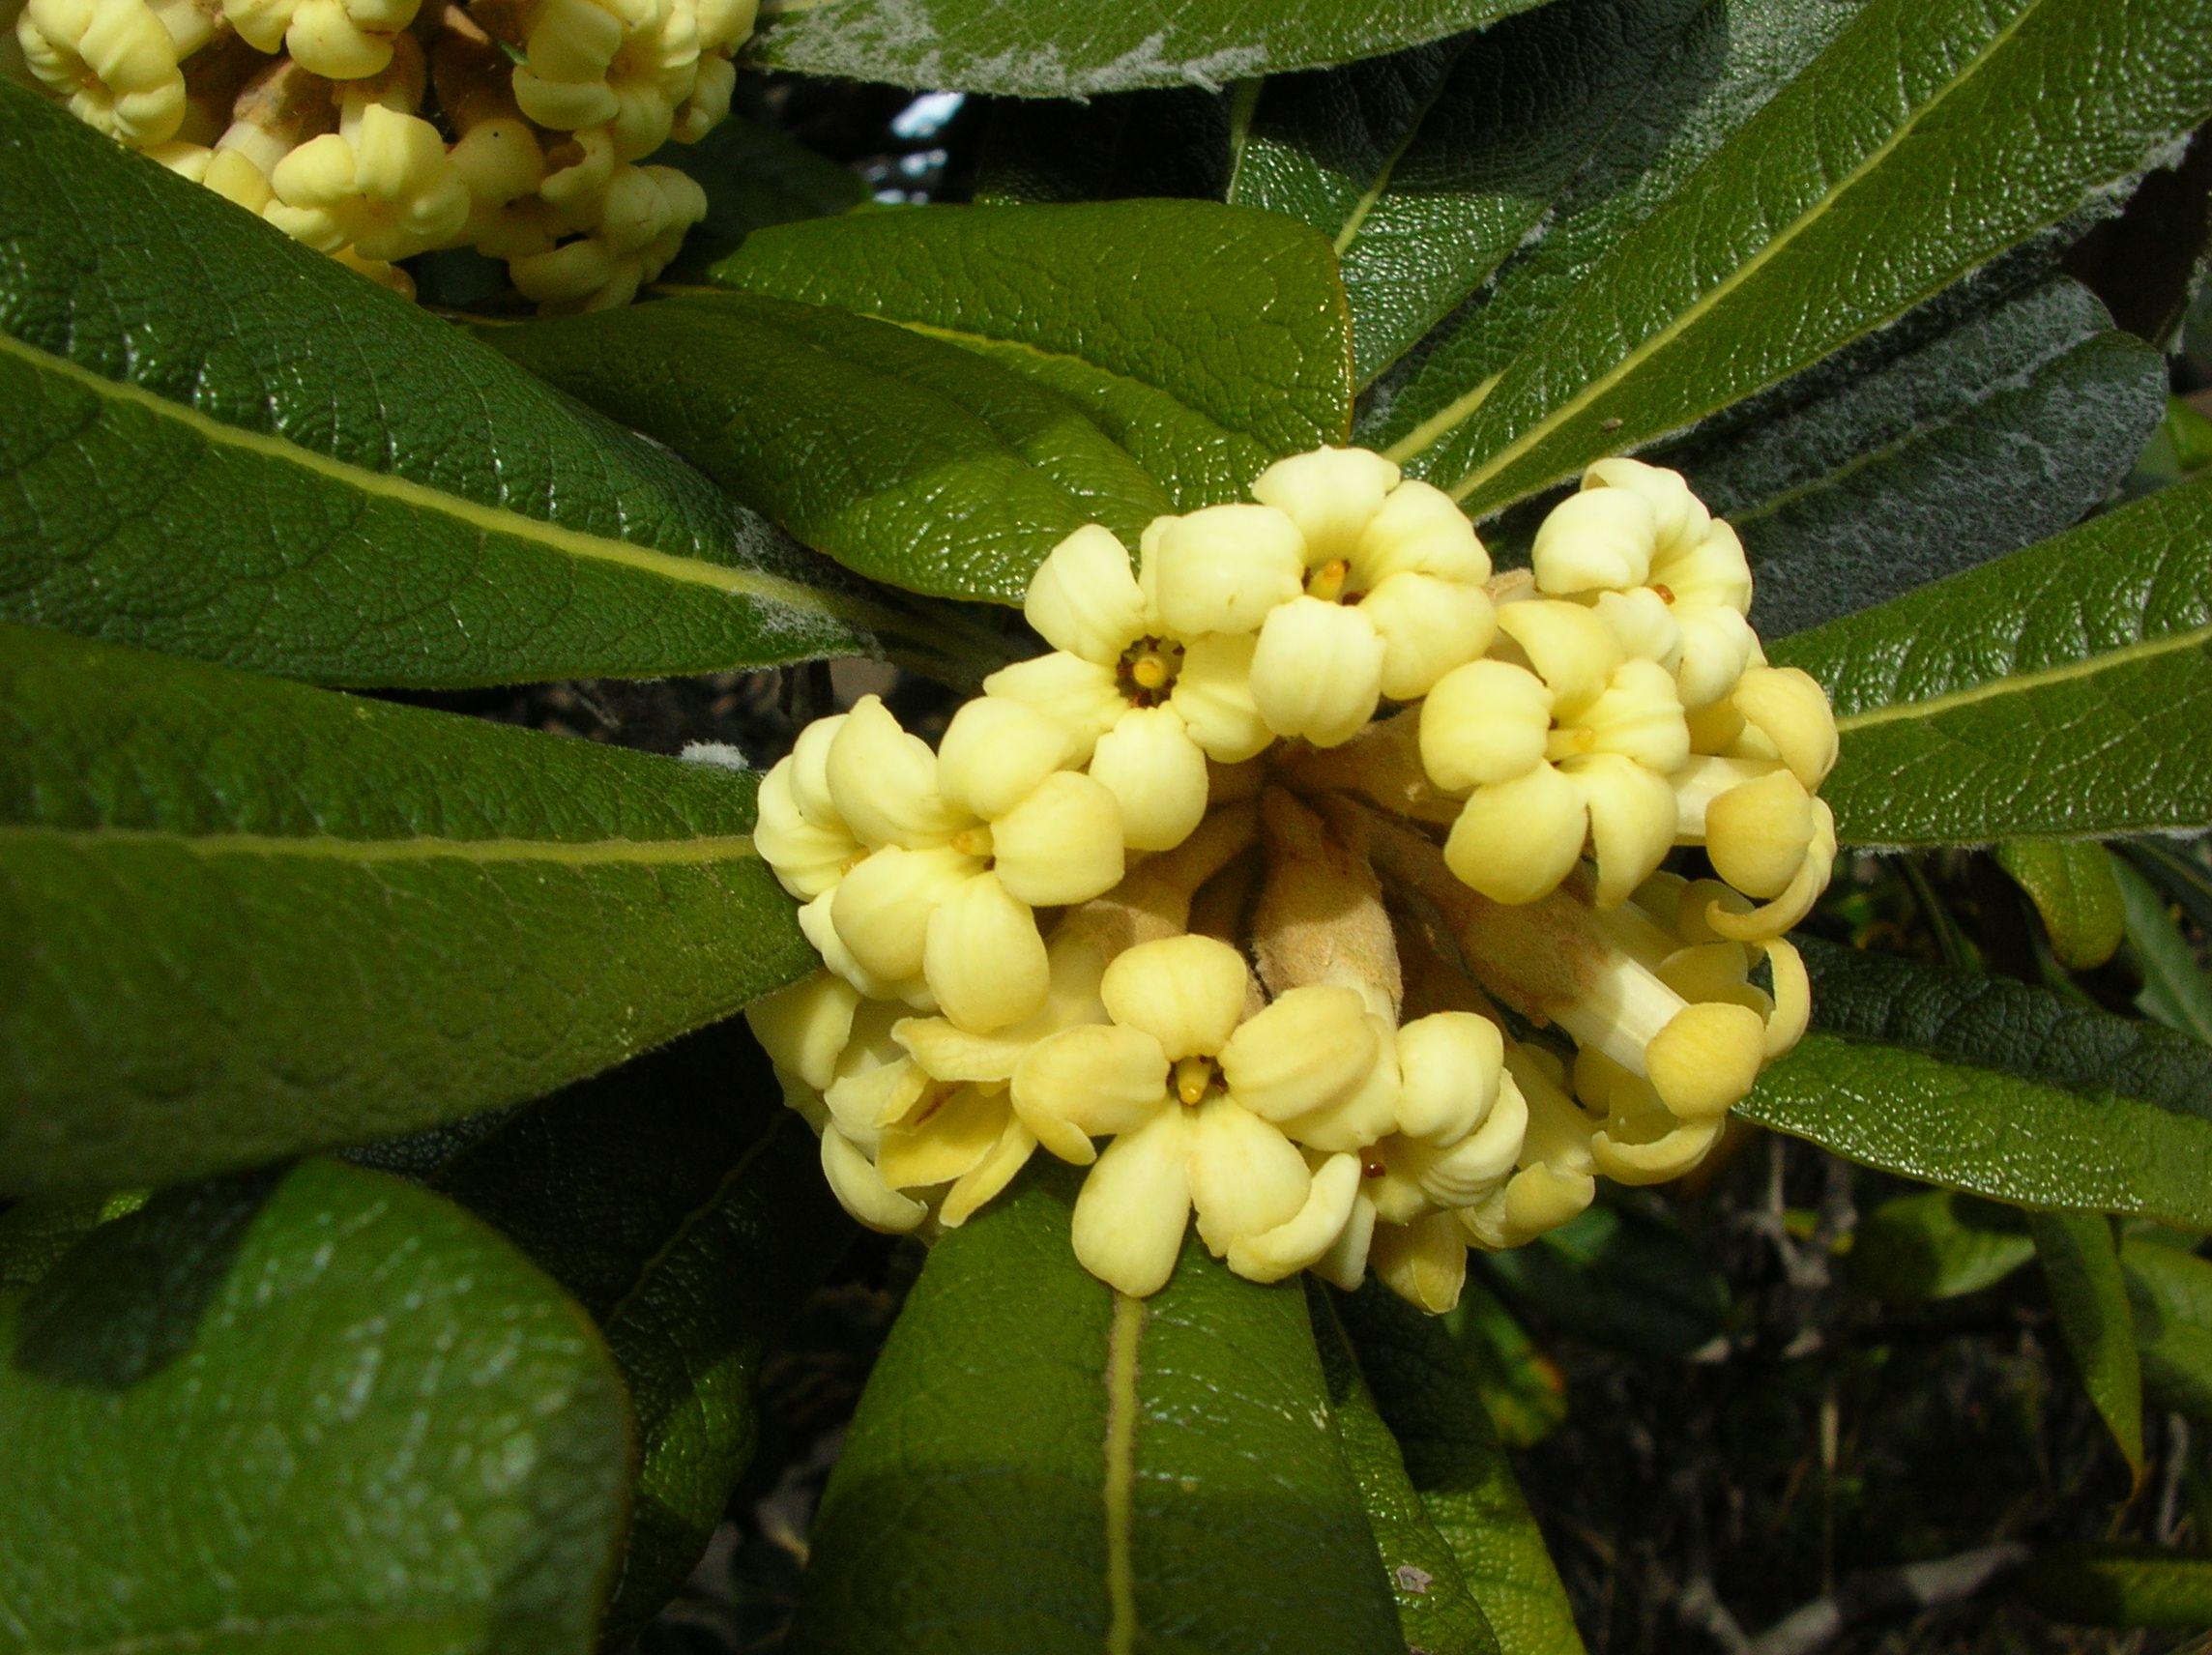 Pittosporum confertiflorum hoawa hawaiian garden pinterest pittosporum confertiflorum hoawa hawaii flowershawaiian izmirmasajfo Images